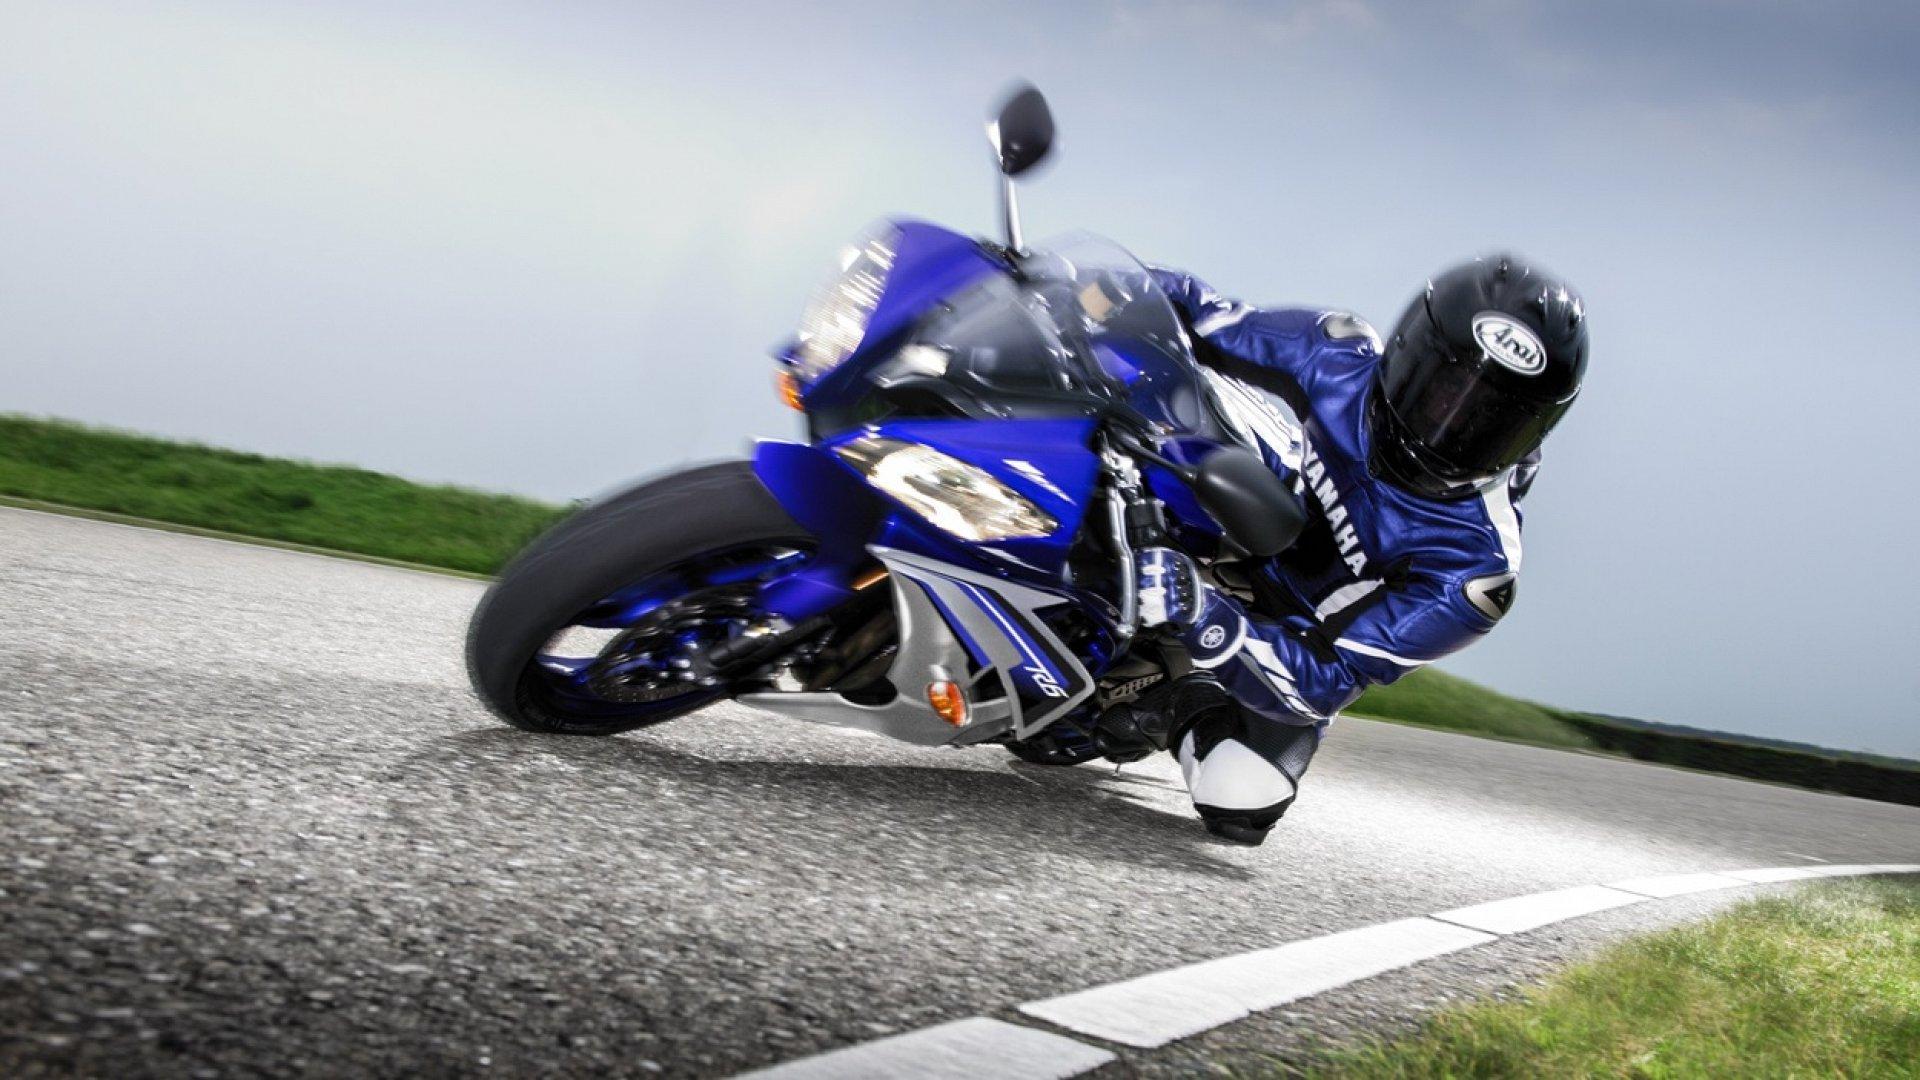 мотоцикл yamaha ybr125 replica технические характеристики